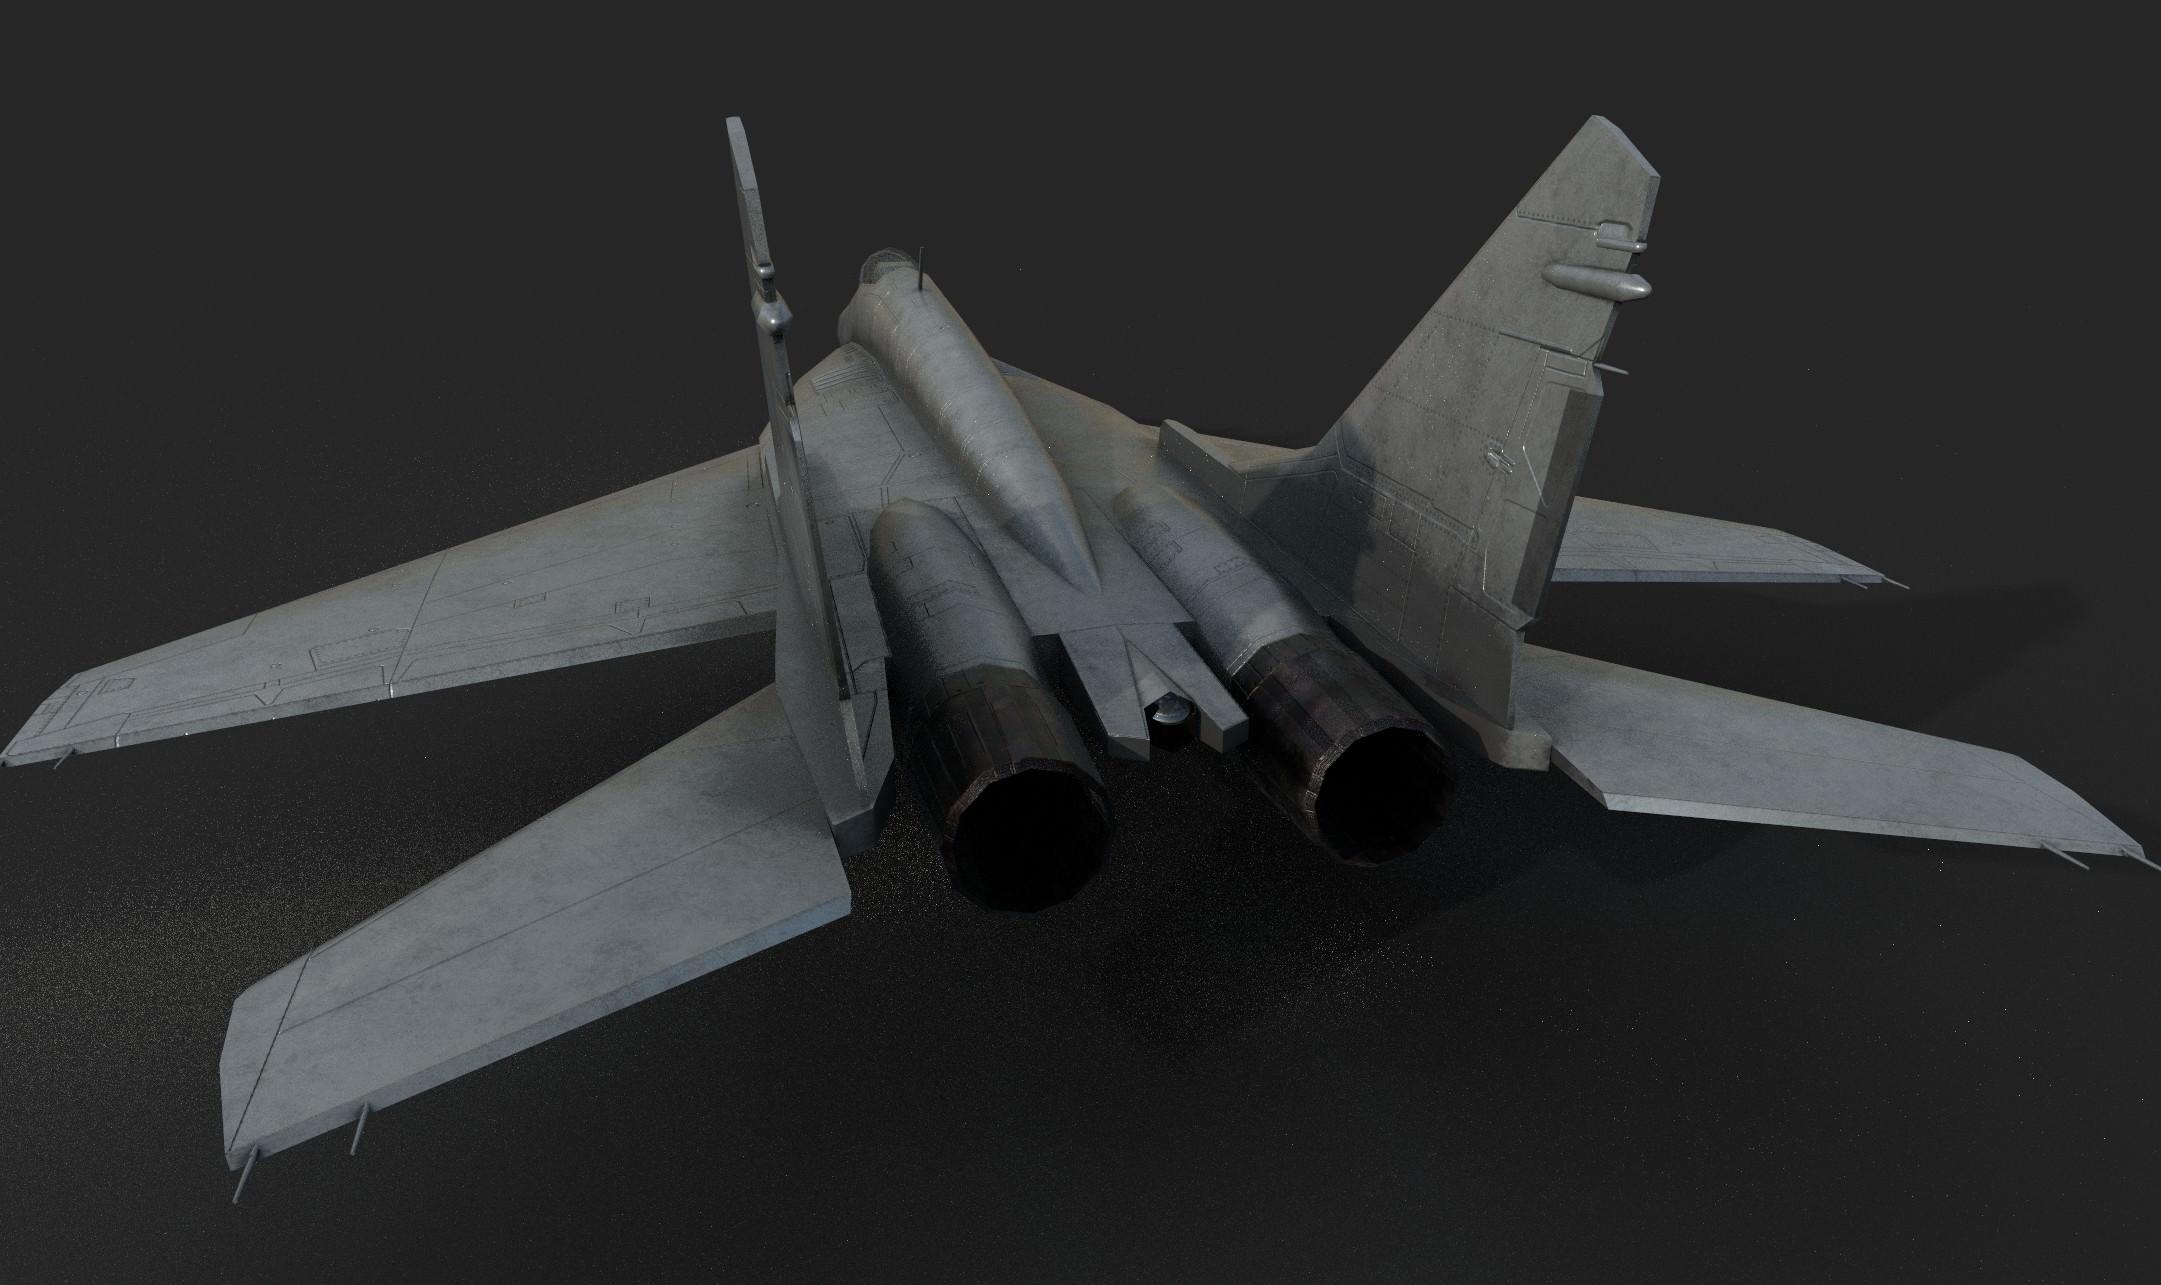 Soviet MiG-29 3